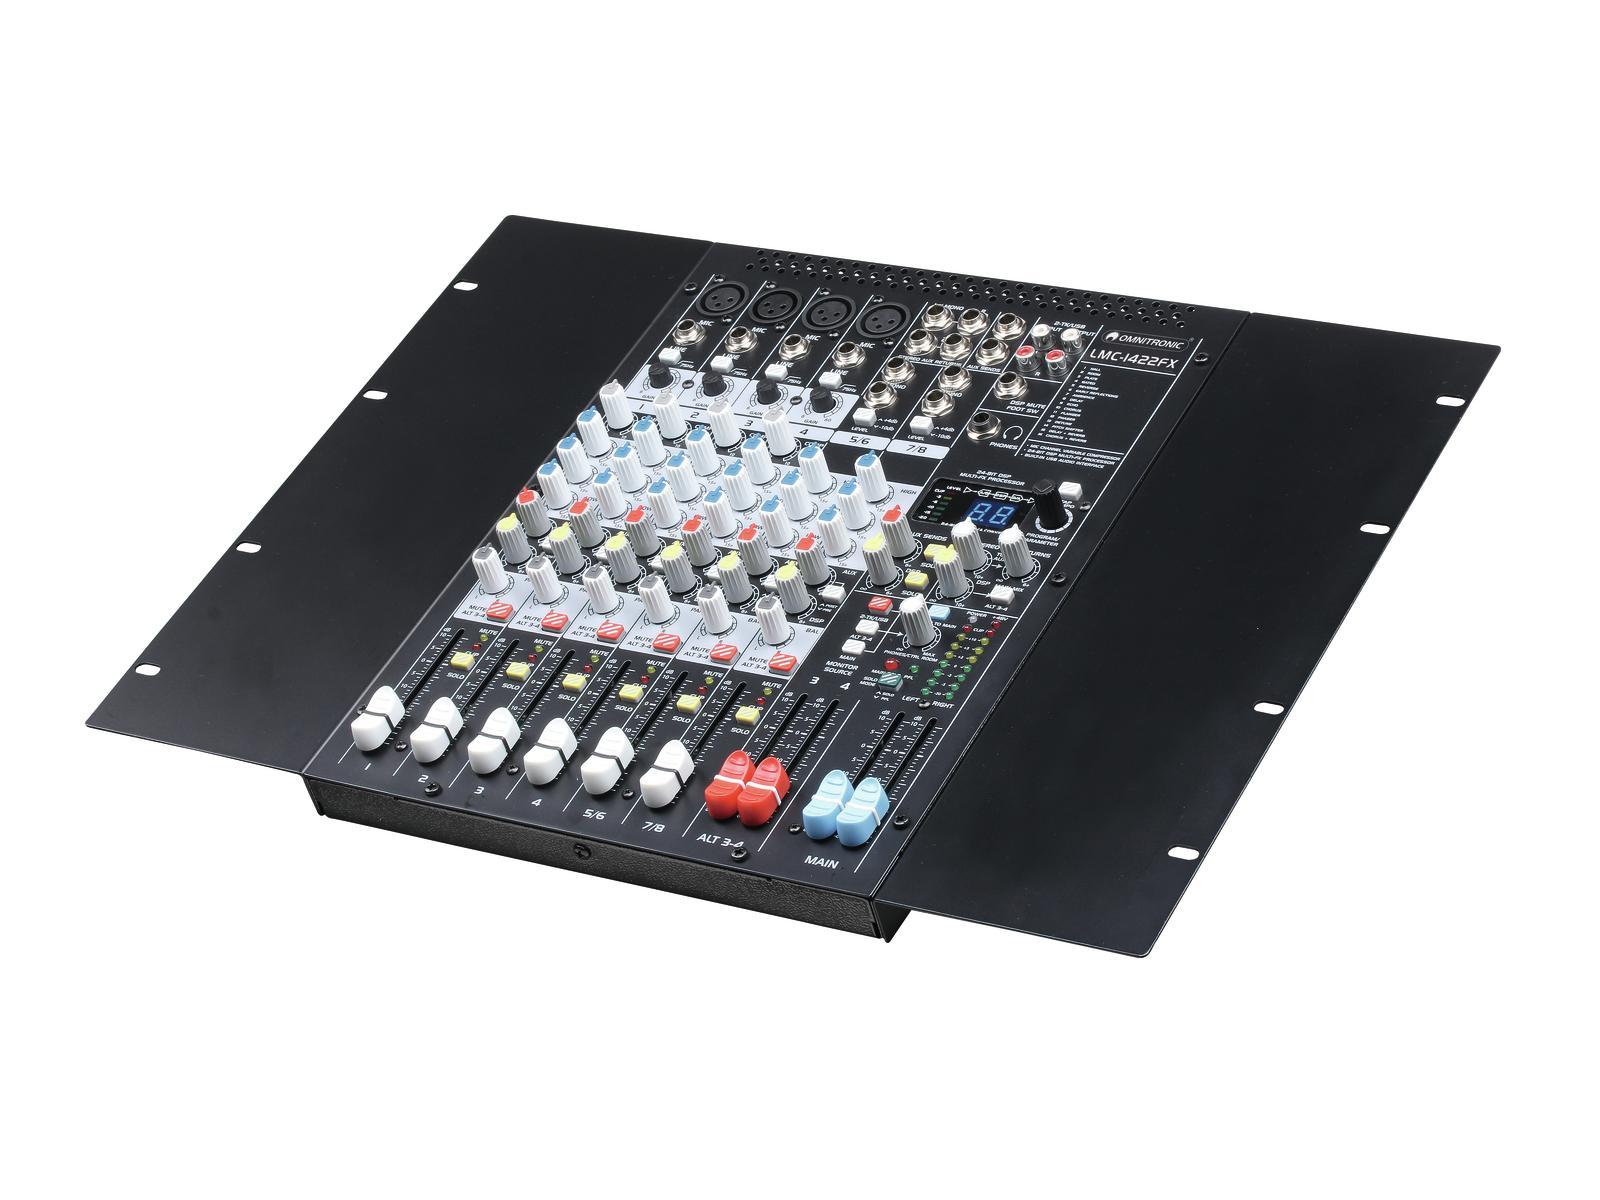 Mixer console dj usb-pc mac 8 channels OMNITRONIC LMC-1422FX